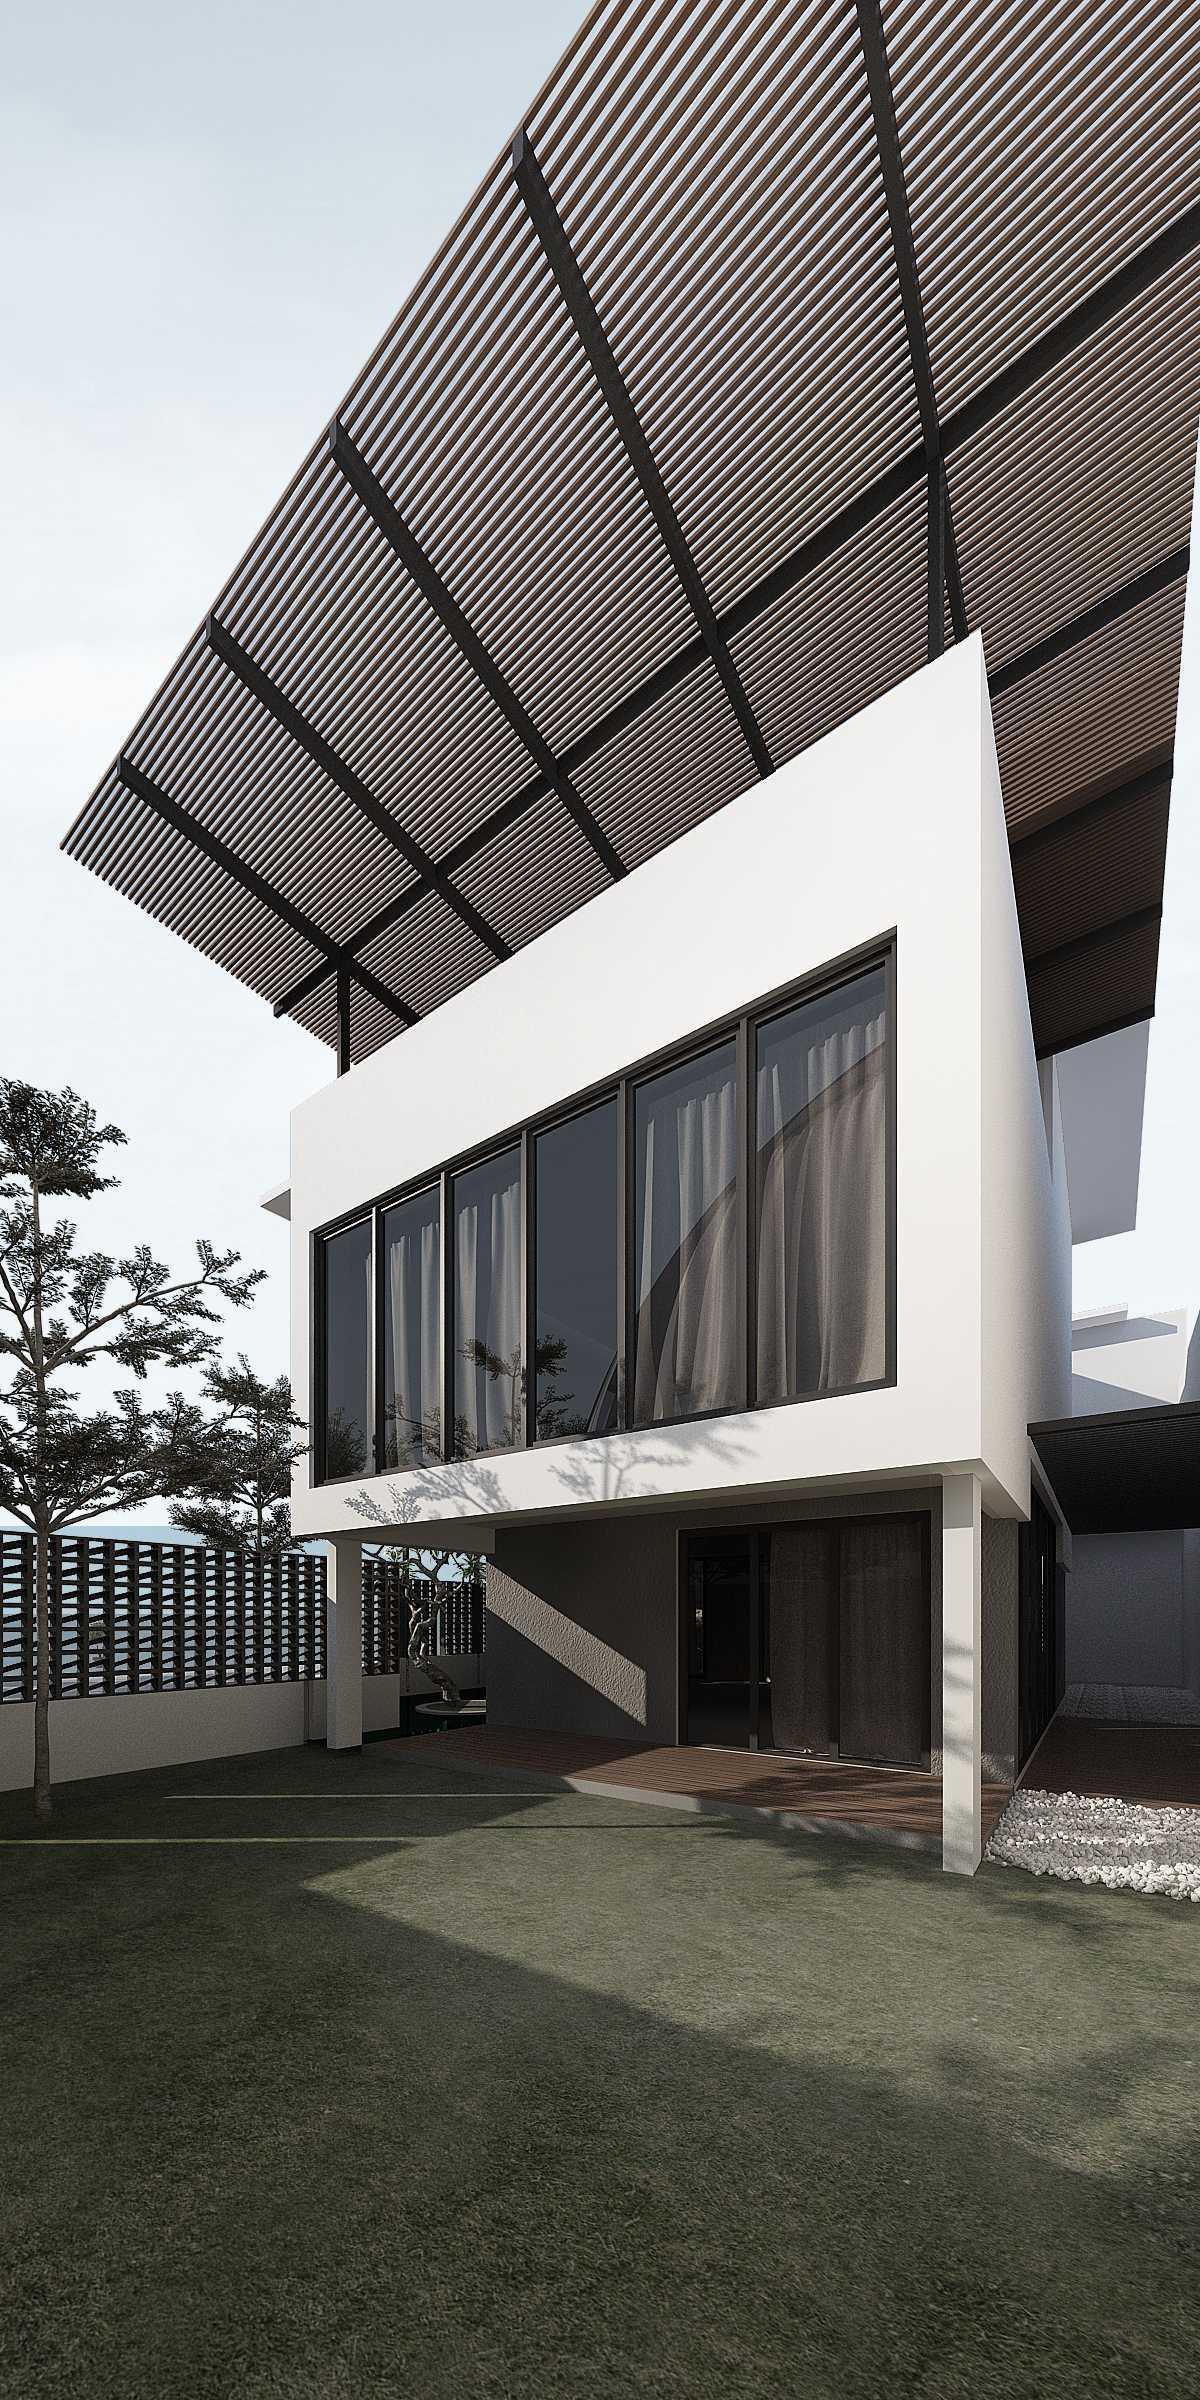 Access Architect Sa House Semarang, Kota Semarang, Jawa Tengah, Indonesia Semarang, Kota Semarang, Jawa Tengah, Indonesia Rumah-Jangli-4   37183